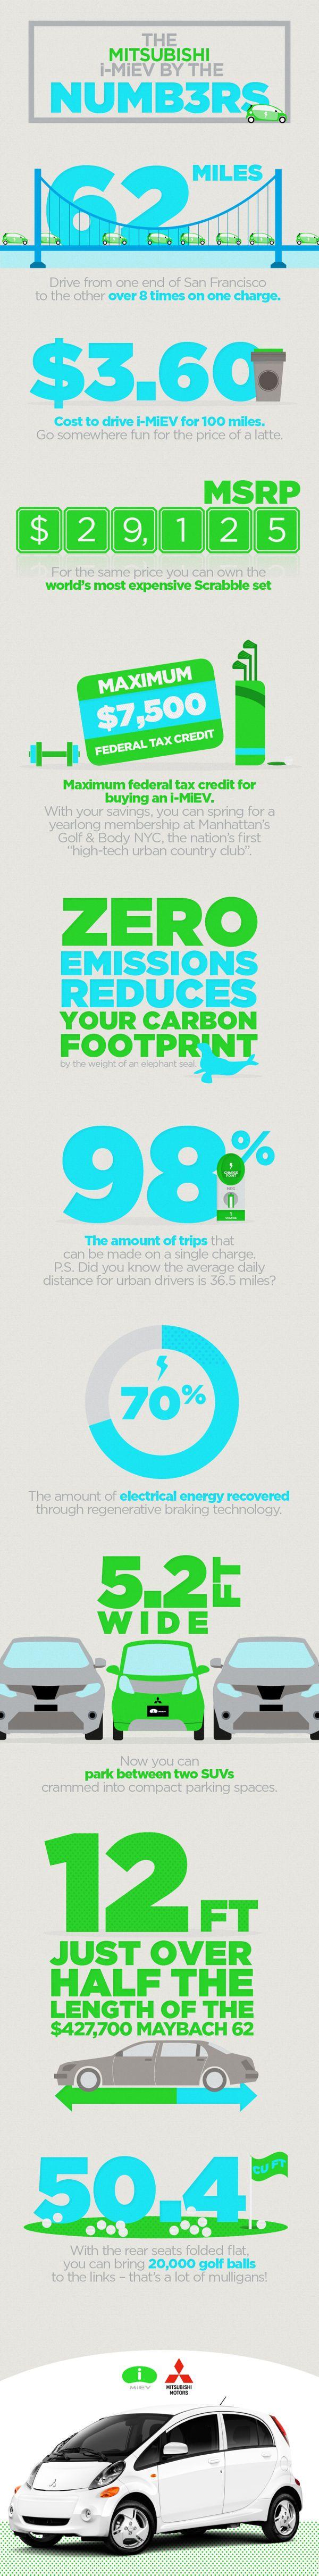 Mitsubishi Motors i-MiEV // infographics by Jonathan Quintin, via Behance